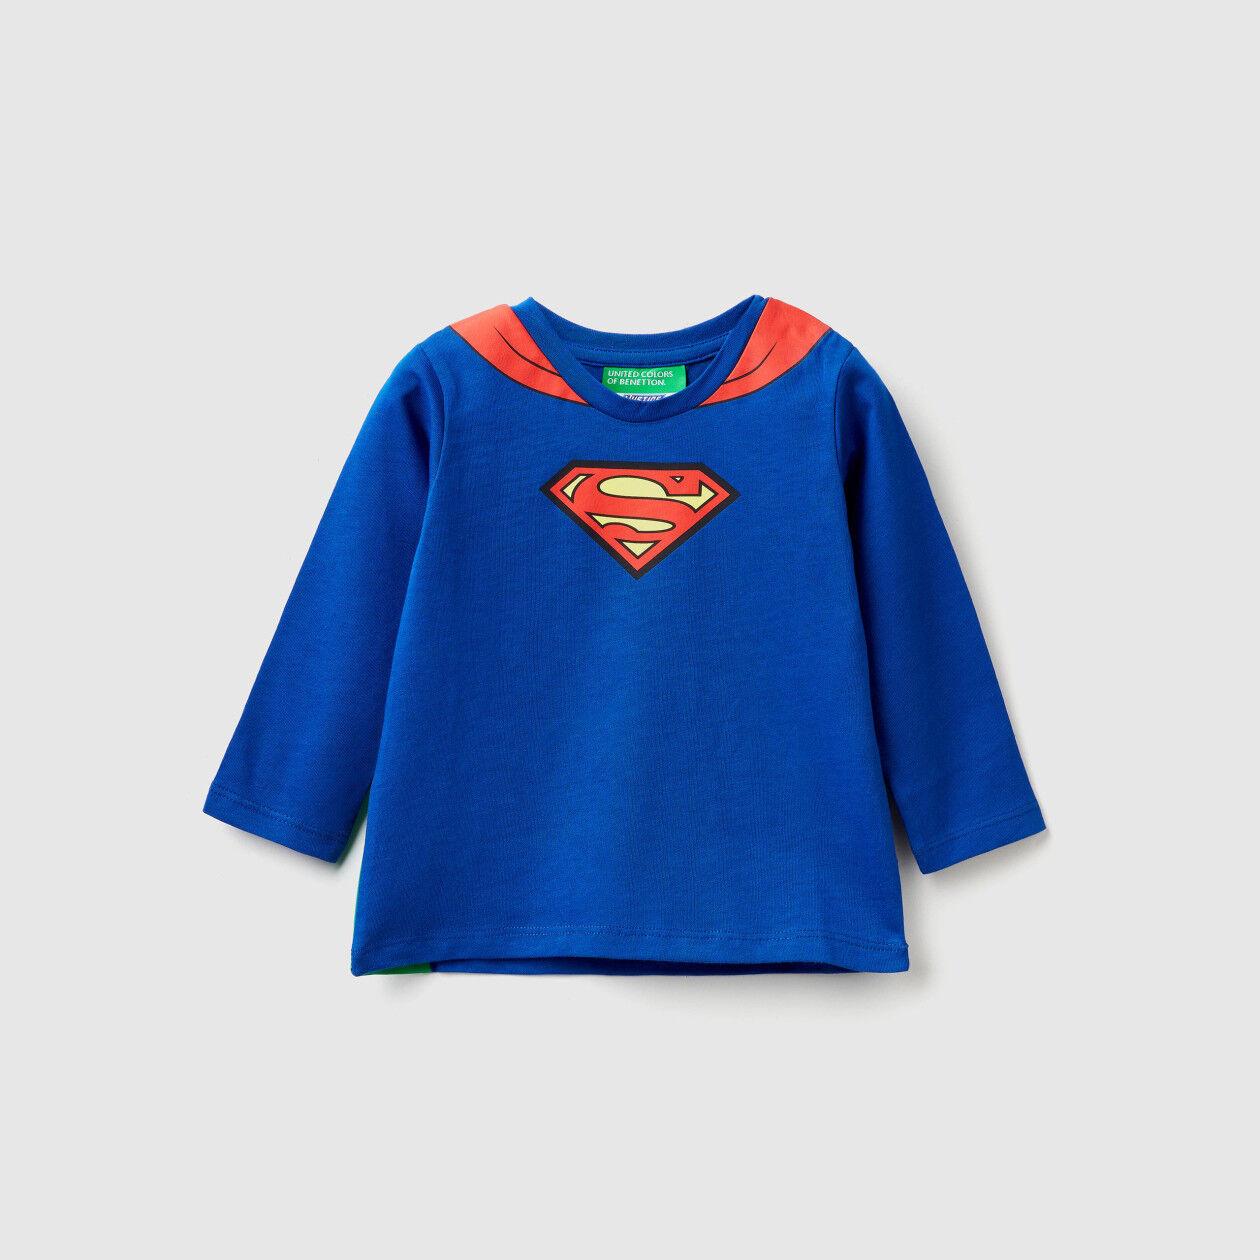 Superhero t-shirt